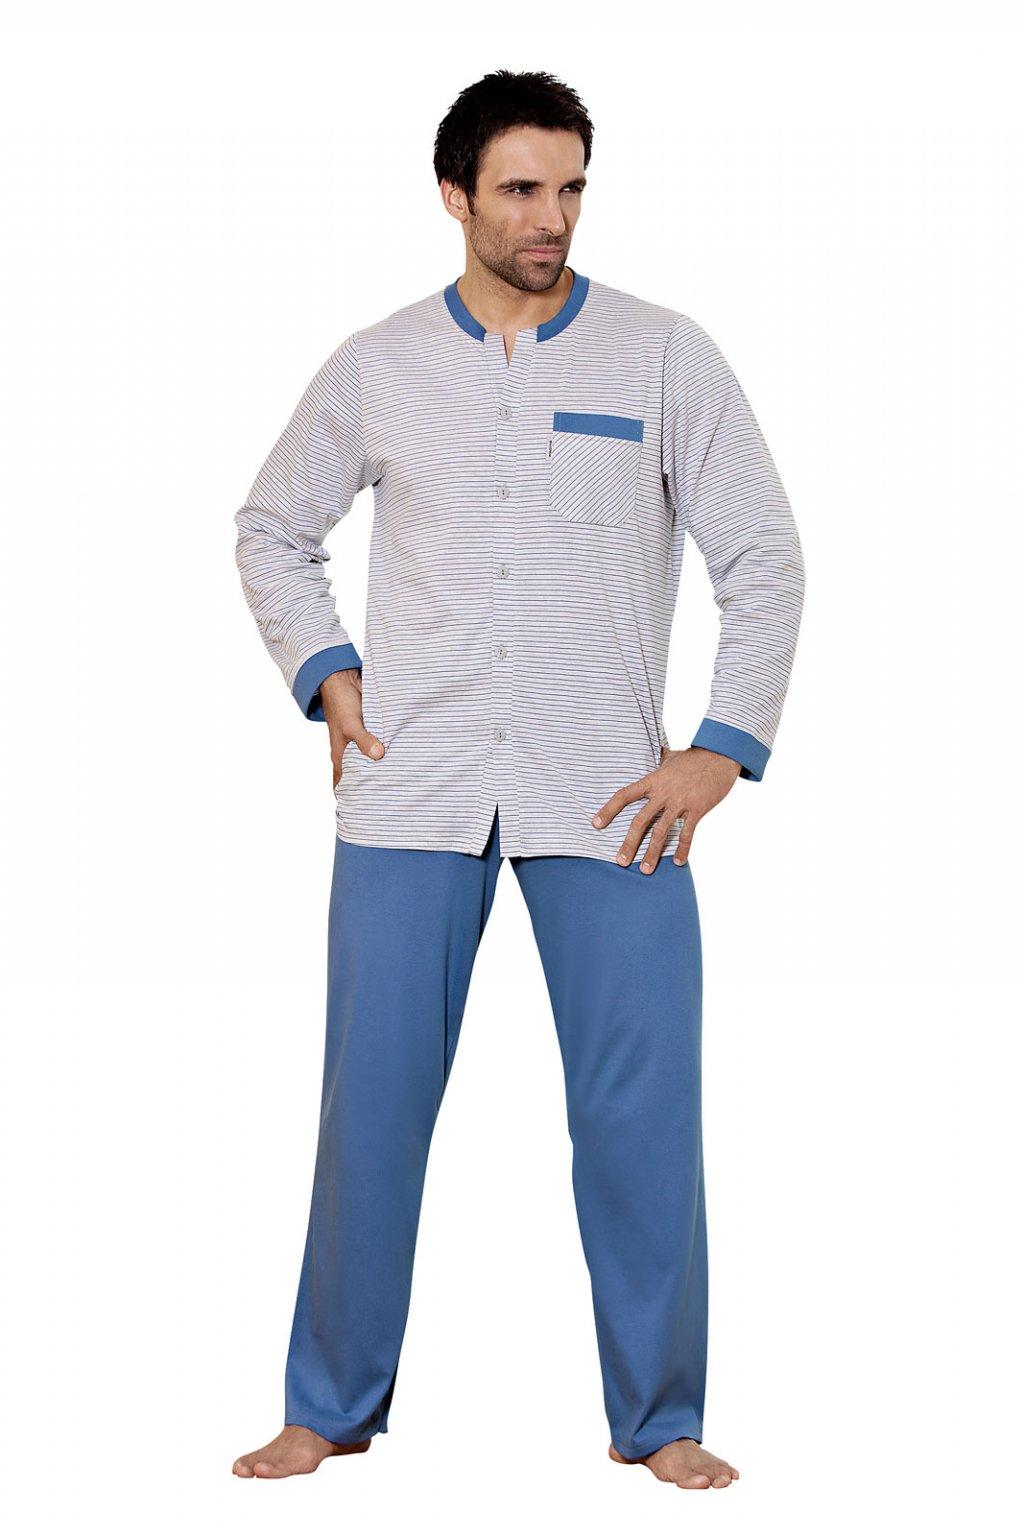 Pánské pyžamo s dlouhým rukávem, 20440 653, šedá